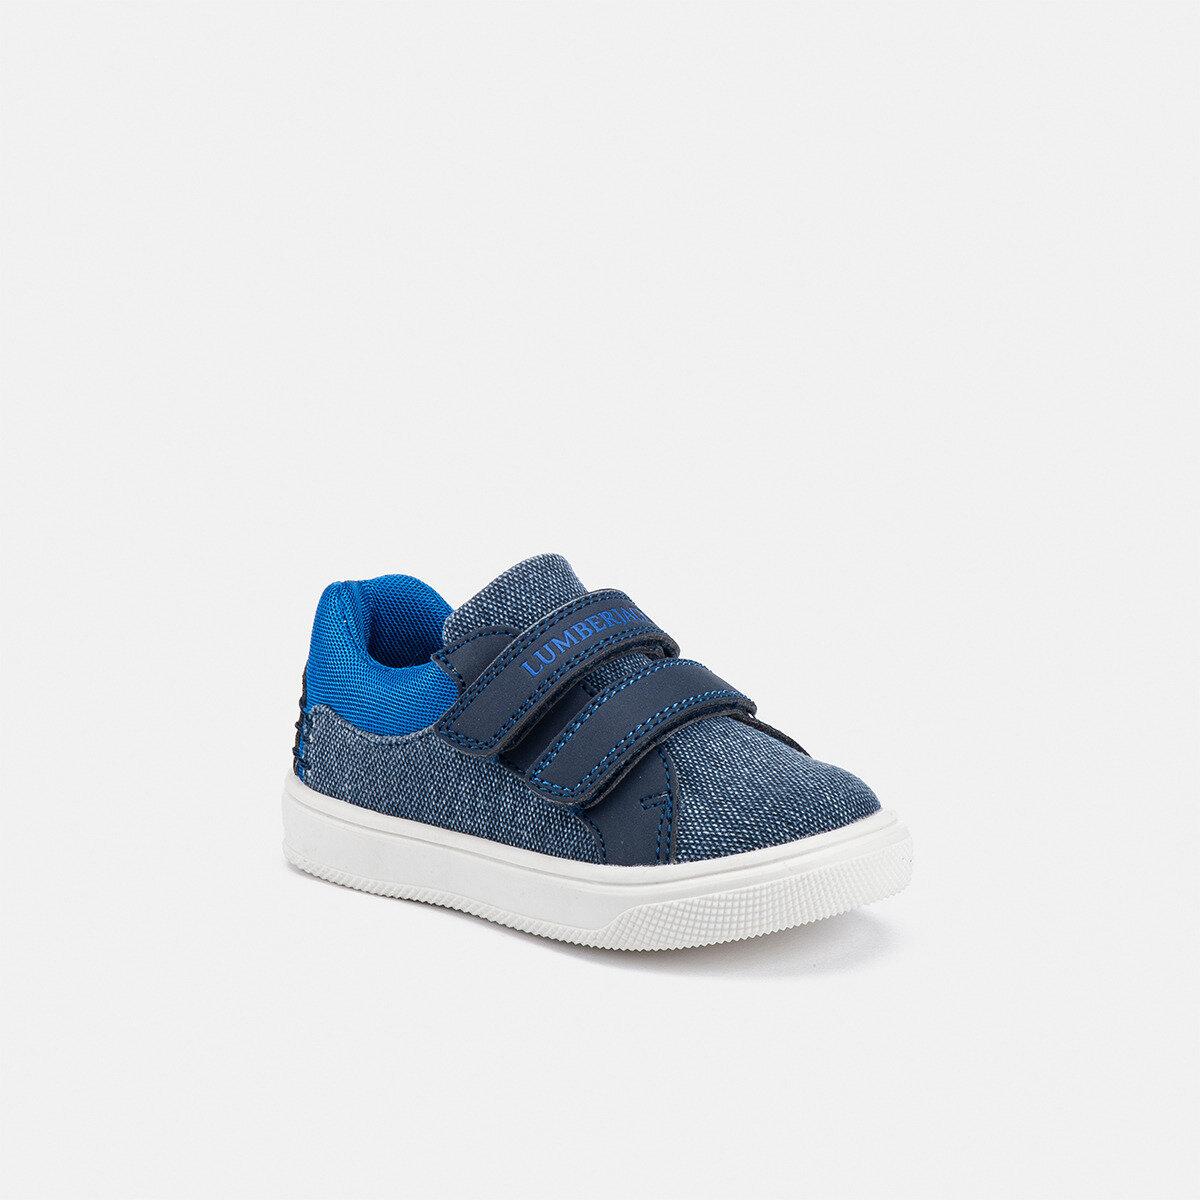 MOBY NAVY BLUE Boy Sneakers